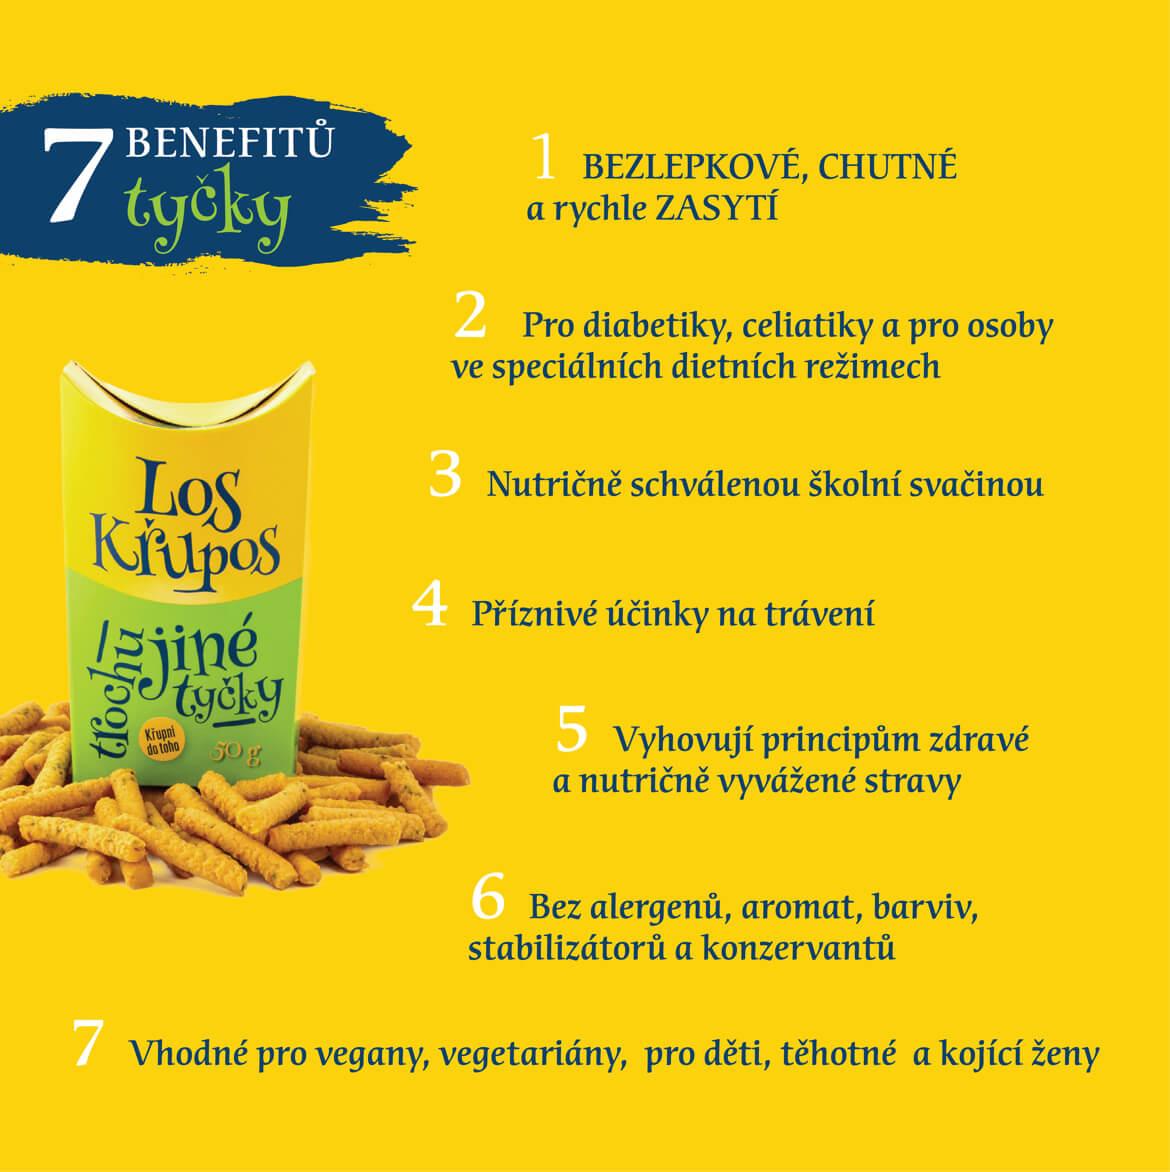 los-krupos-tycky-50g-benefity-detail